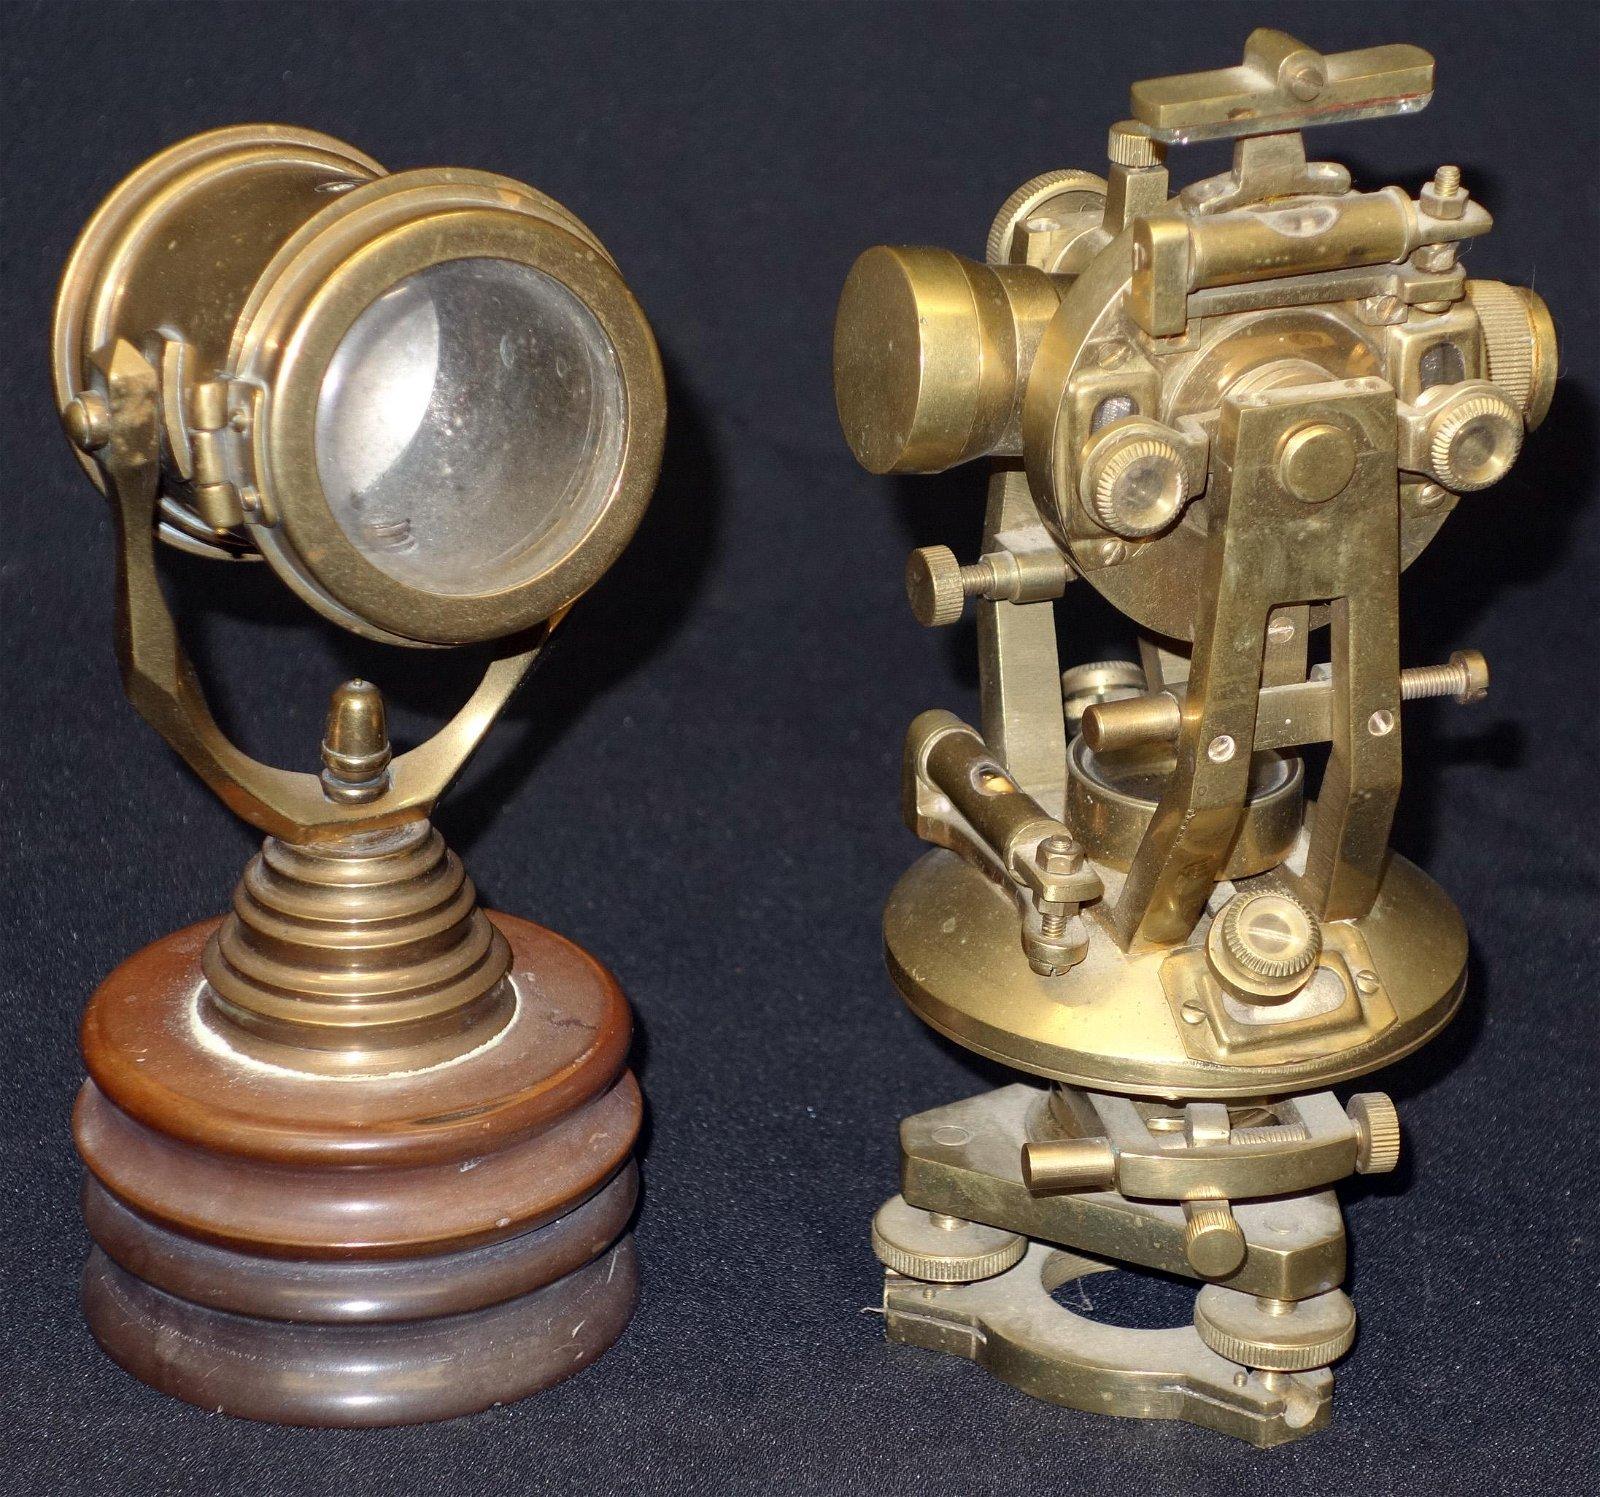 SCALE TELESCOPE AND LIGHT